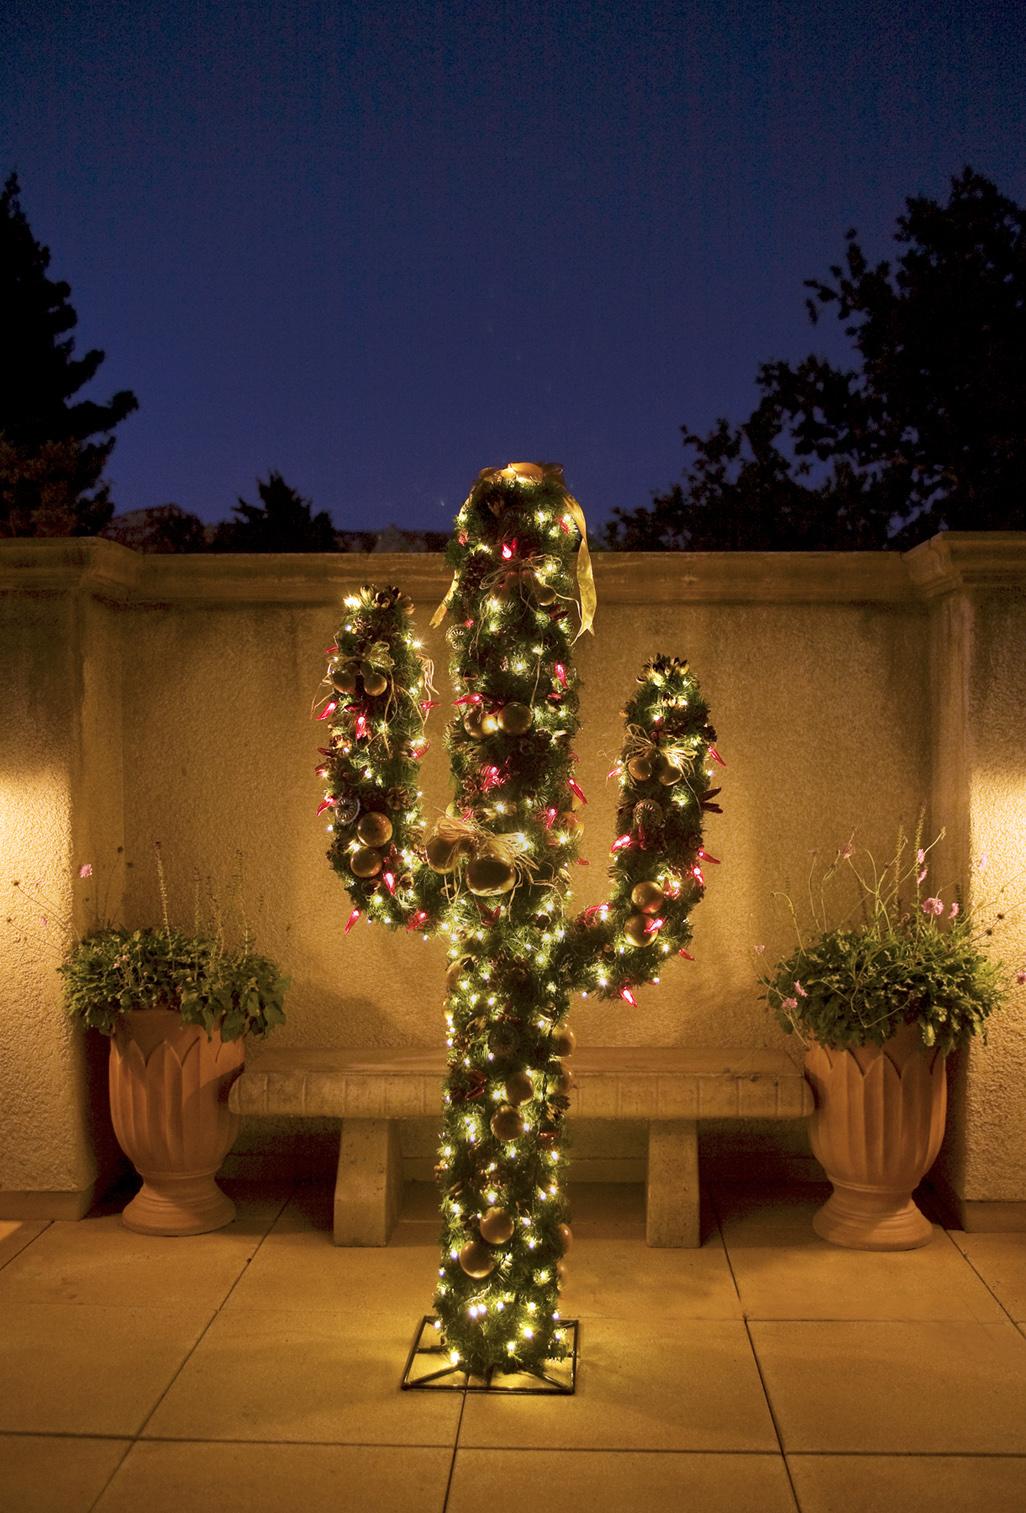 Christmas Trees As Art Sedonas Tlaquepaque Presents Festival Of Trees Arizona Travel